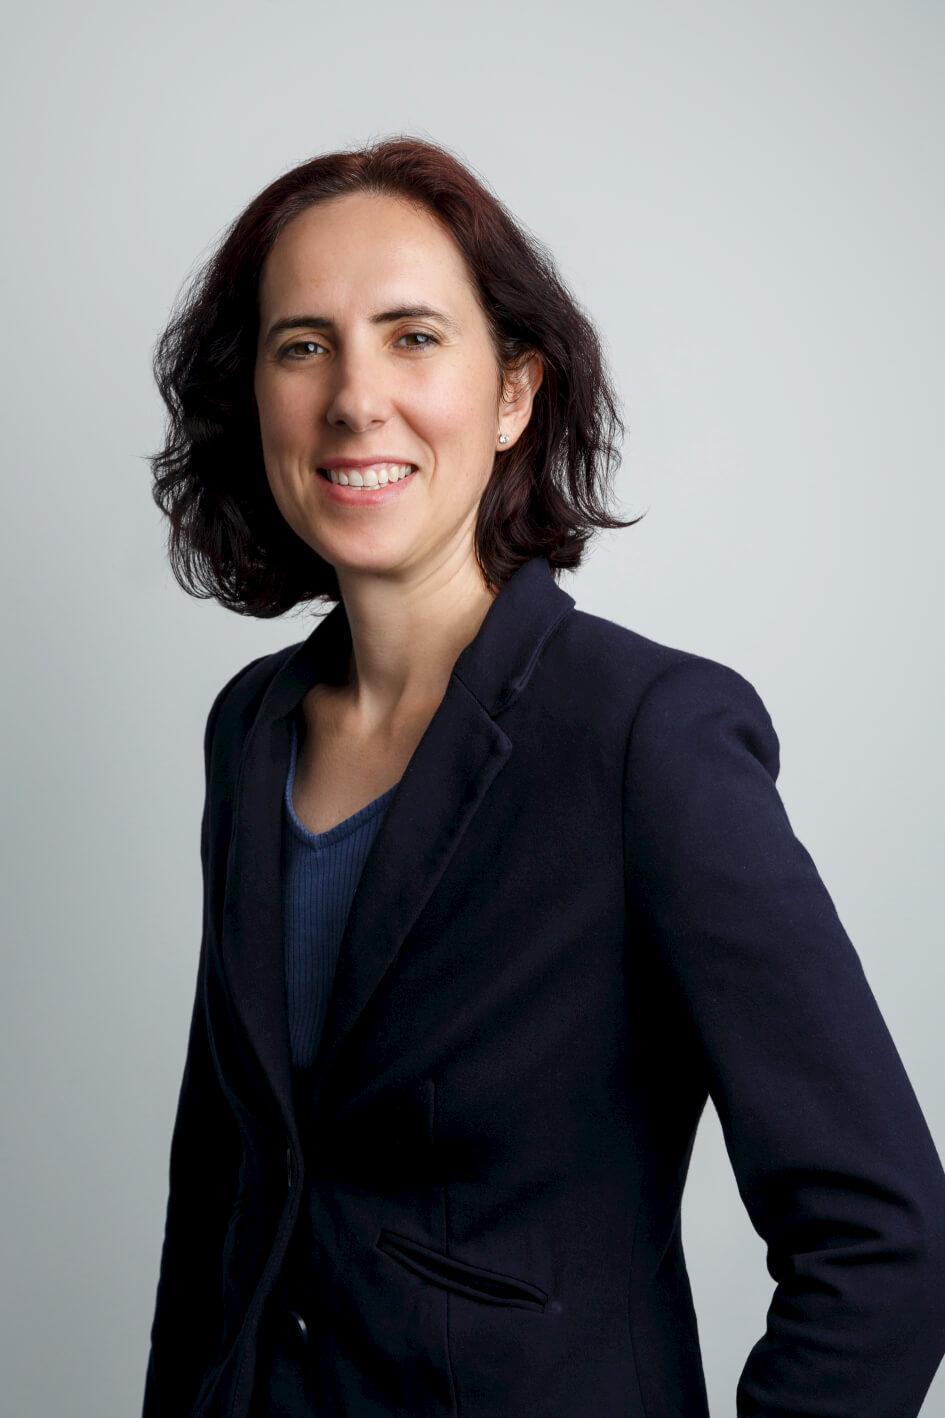 Senior Accounting Tax & Advisory Accountant Emma Davenish - Here Business & Wealth